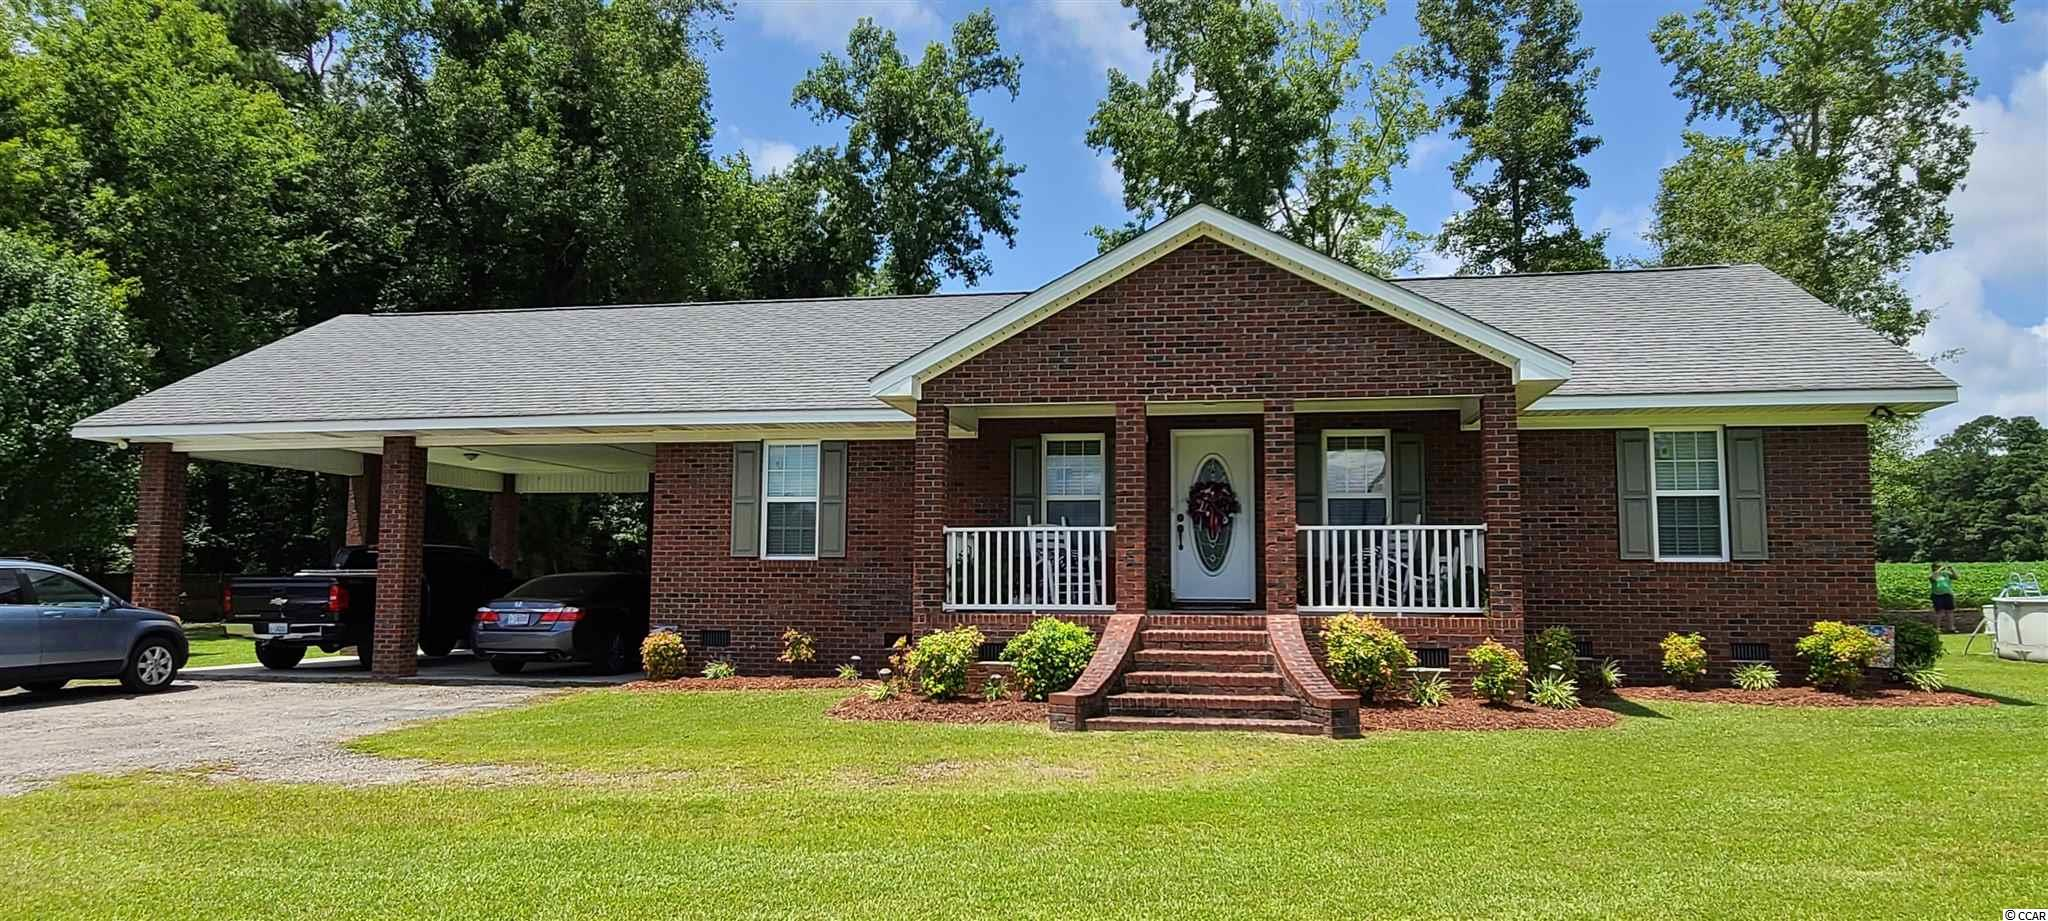 8830 James B White Hwy. Property Photo